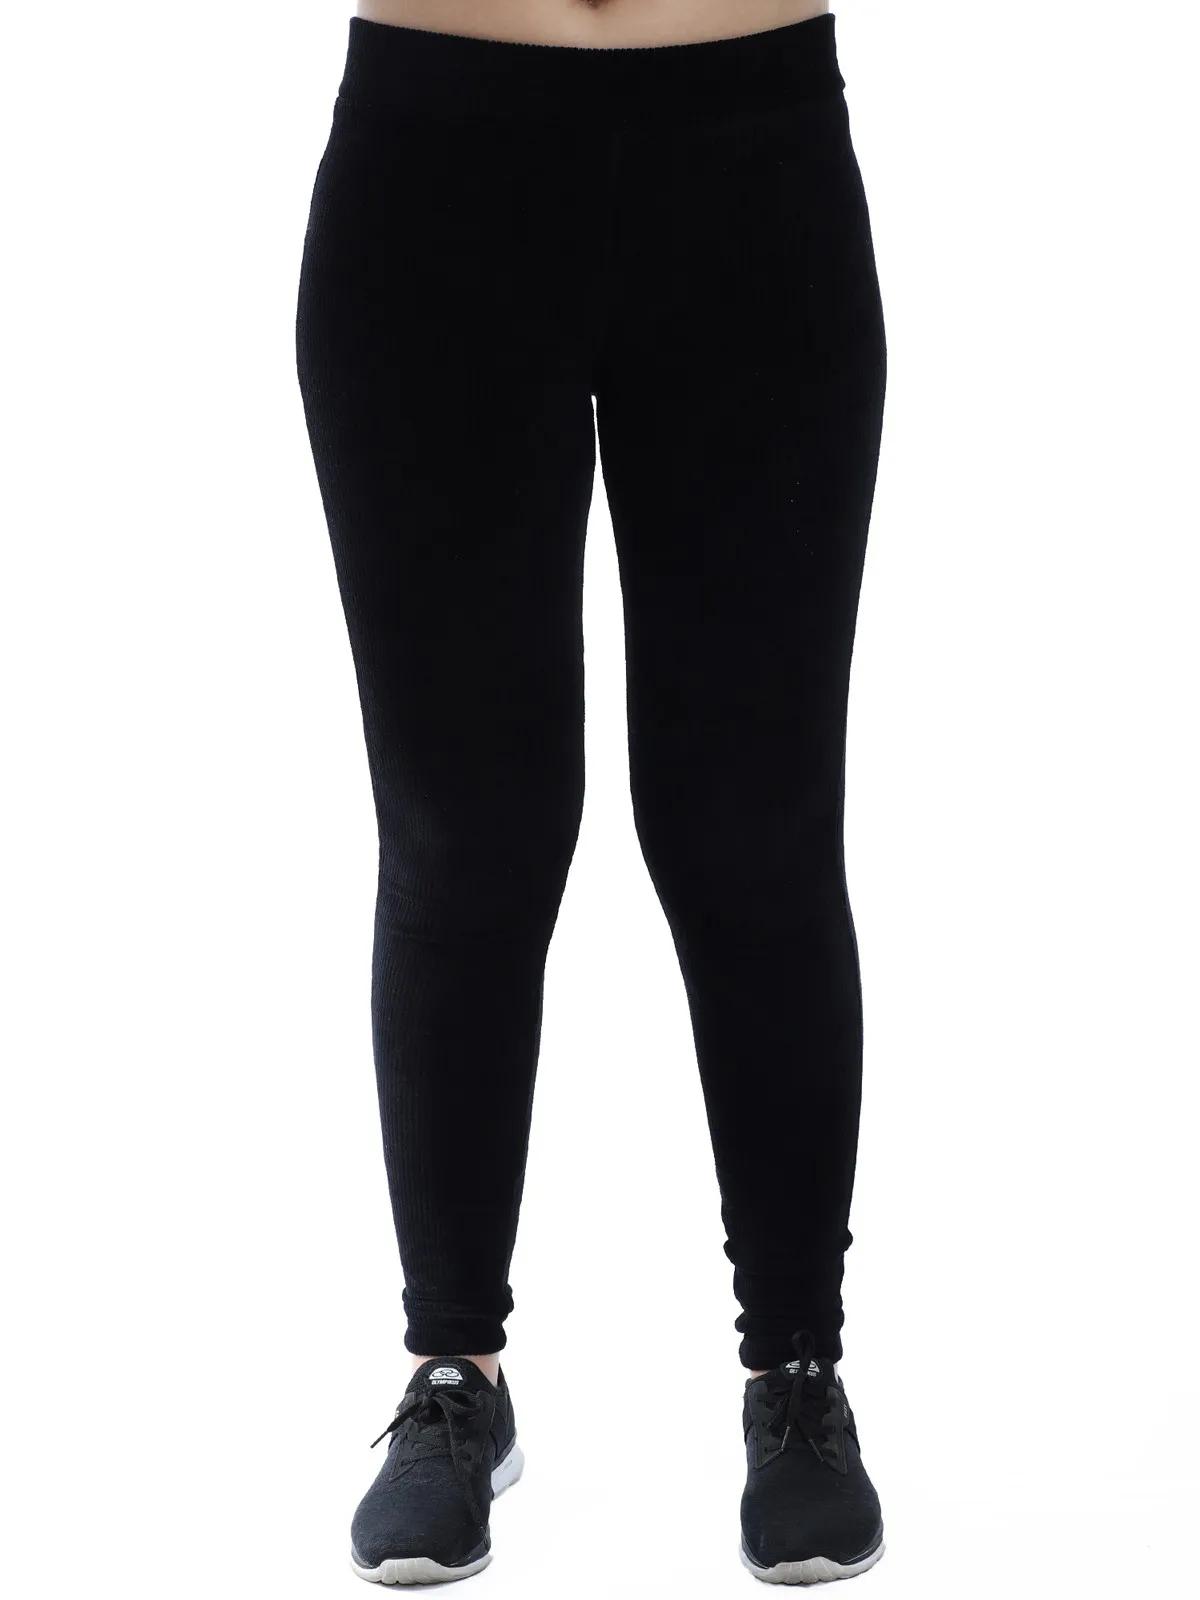 Calça Legging Feminina Veludo Cotele Confort Grossa Preta